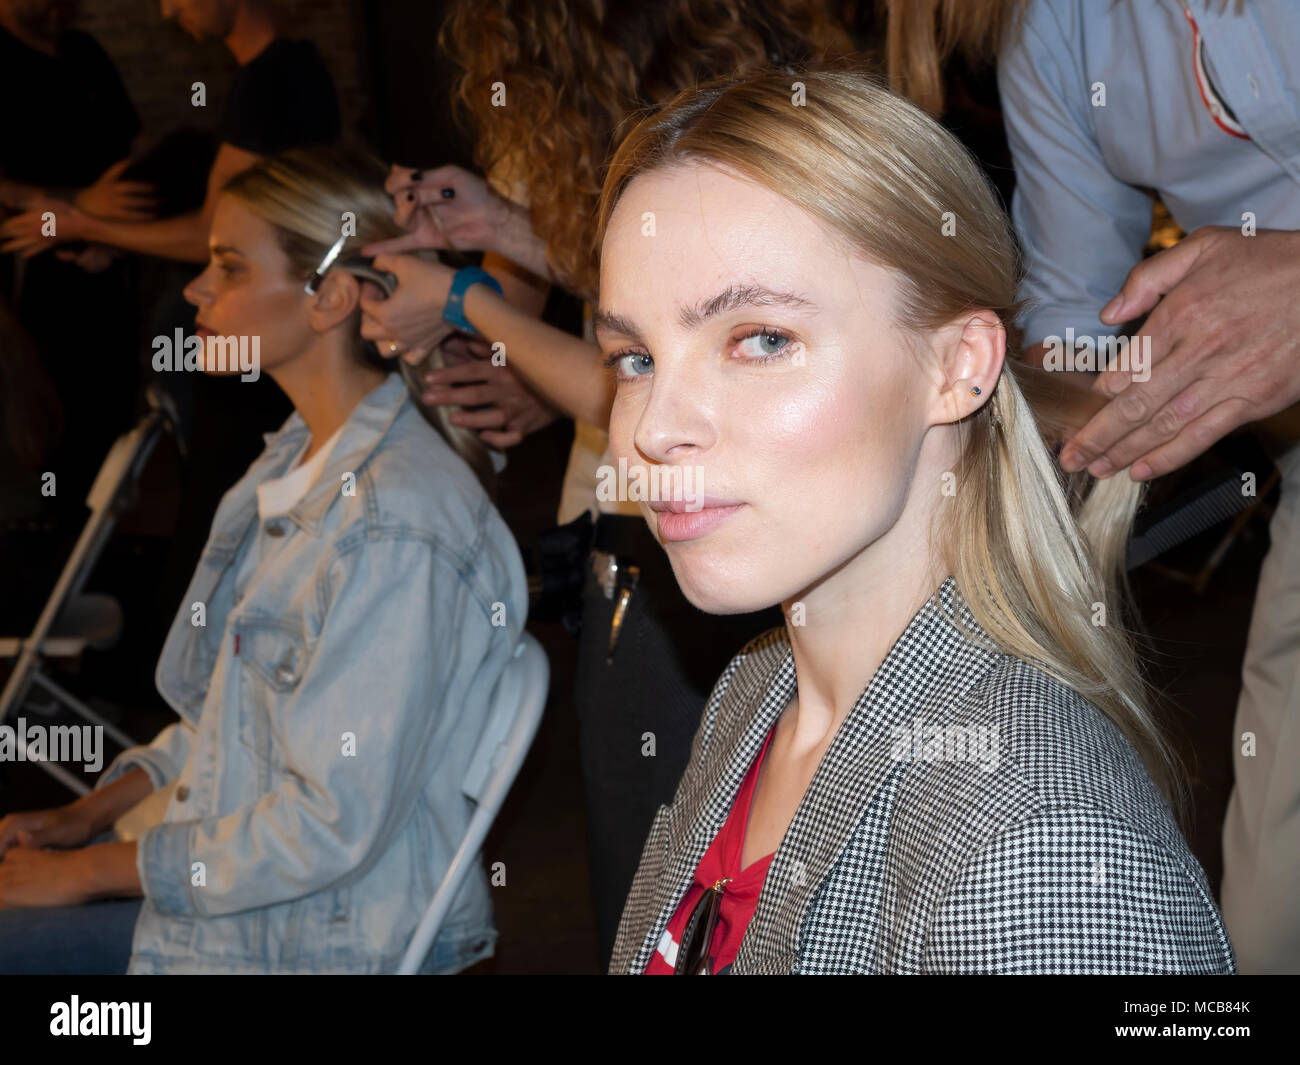 NEW YORK, NY, USA - APRIL 14, 2018: A model prepares backstage for Adam Zohar collection during New York Bridal Week at Industria, Manhattan Credit: Sam Aronov/Alamy Live News - Stock Image